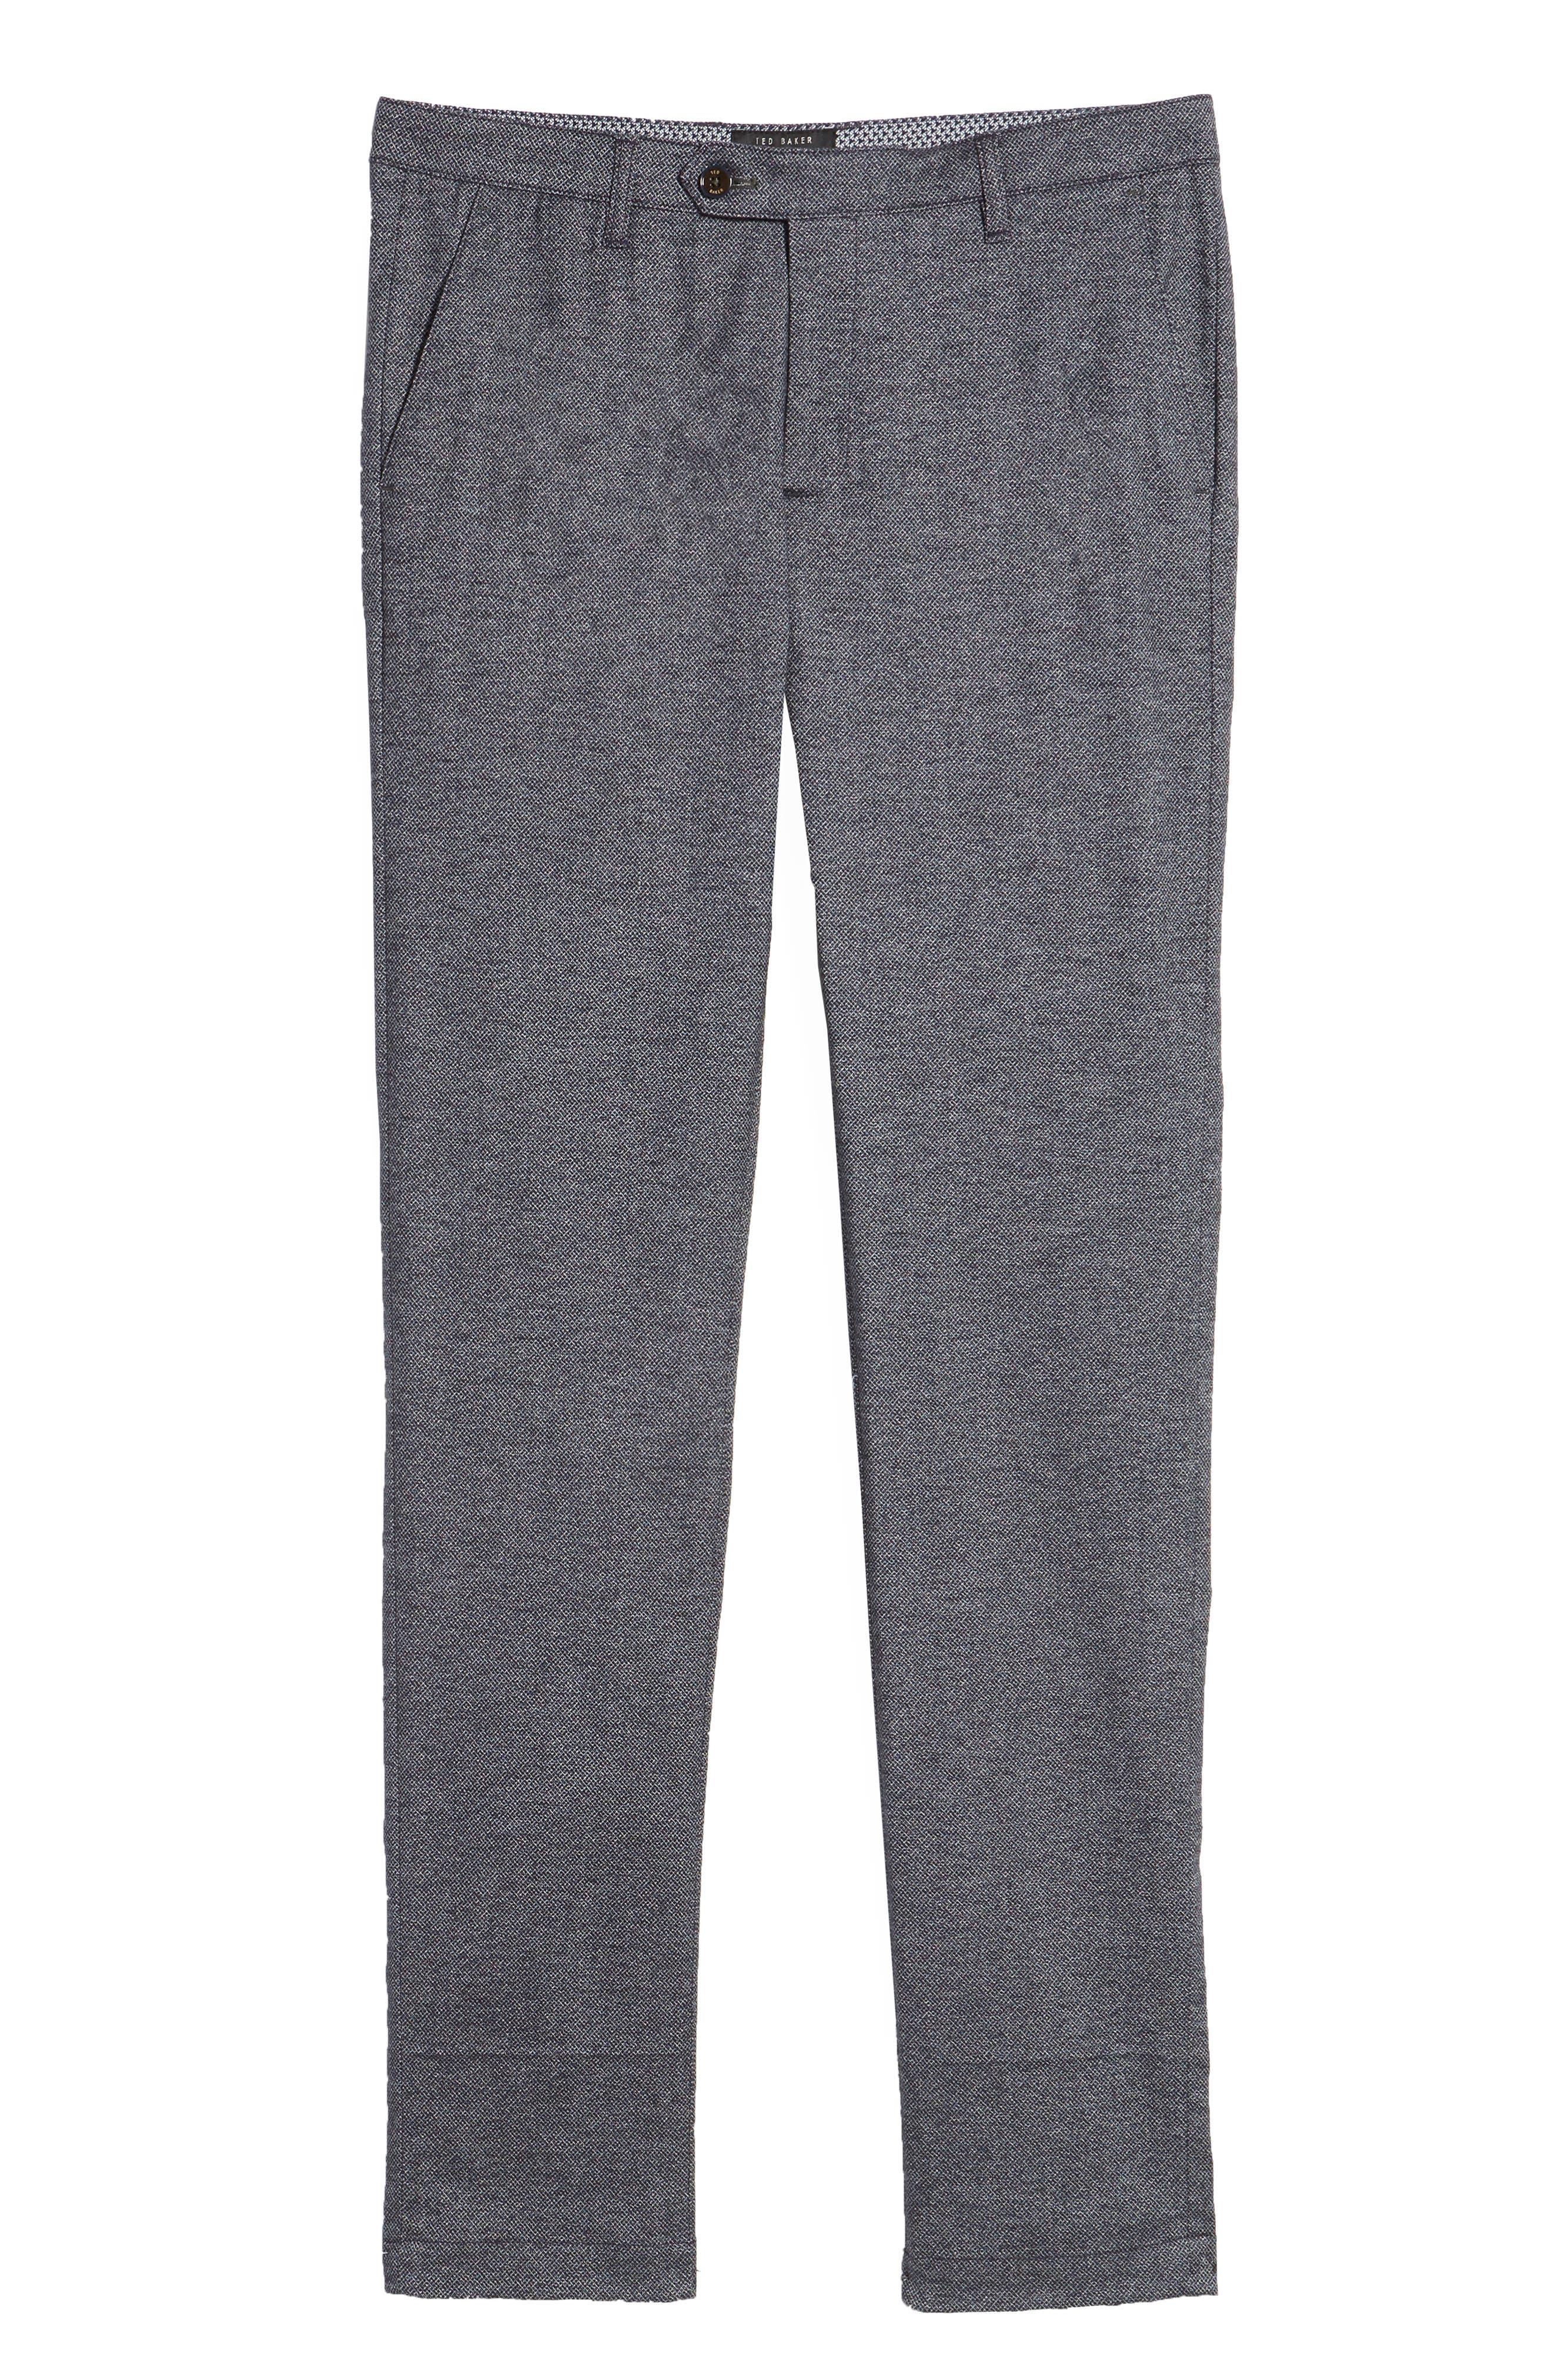 Pintztt Flat Front Stretch Solid Cotton Pants,                             Alternate thumbnail 6, color,